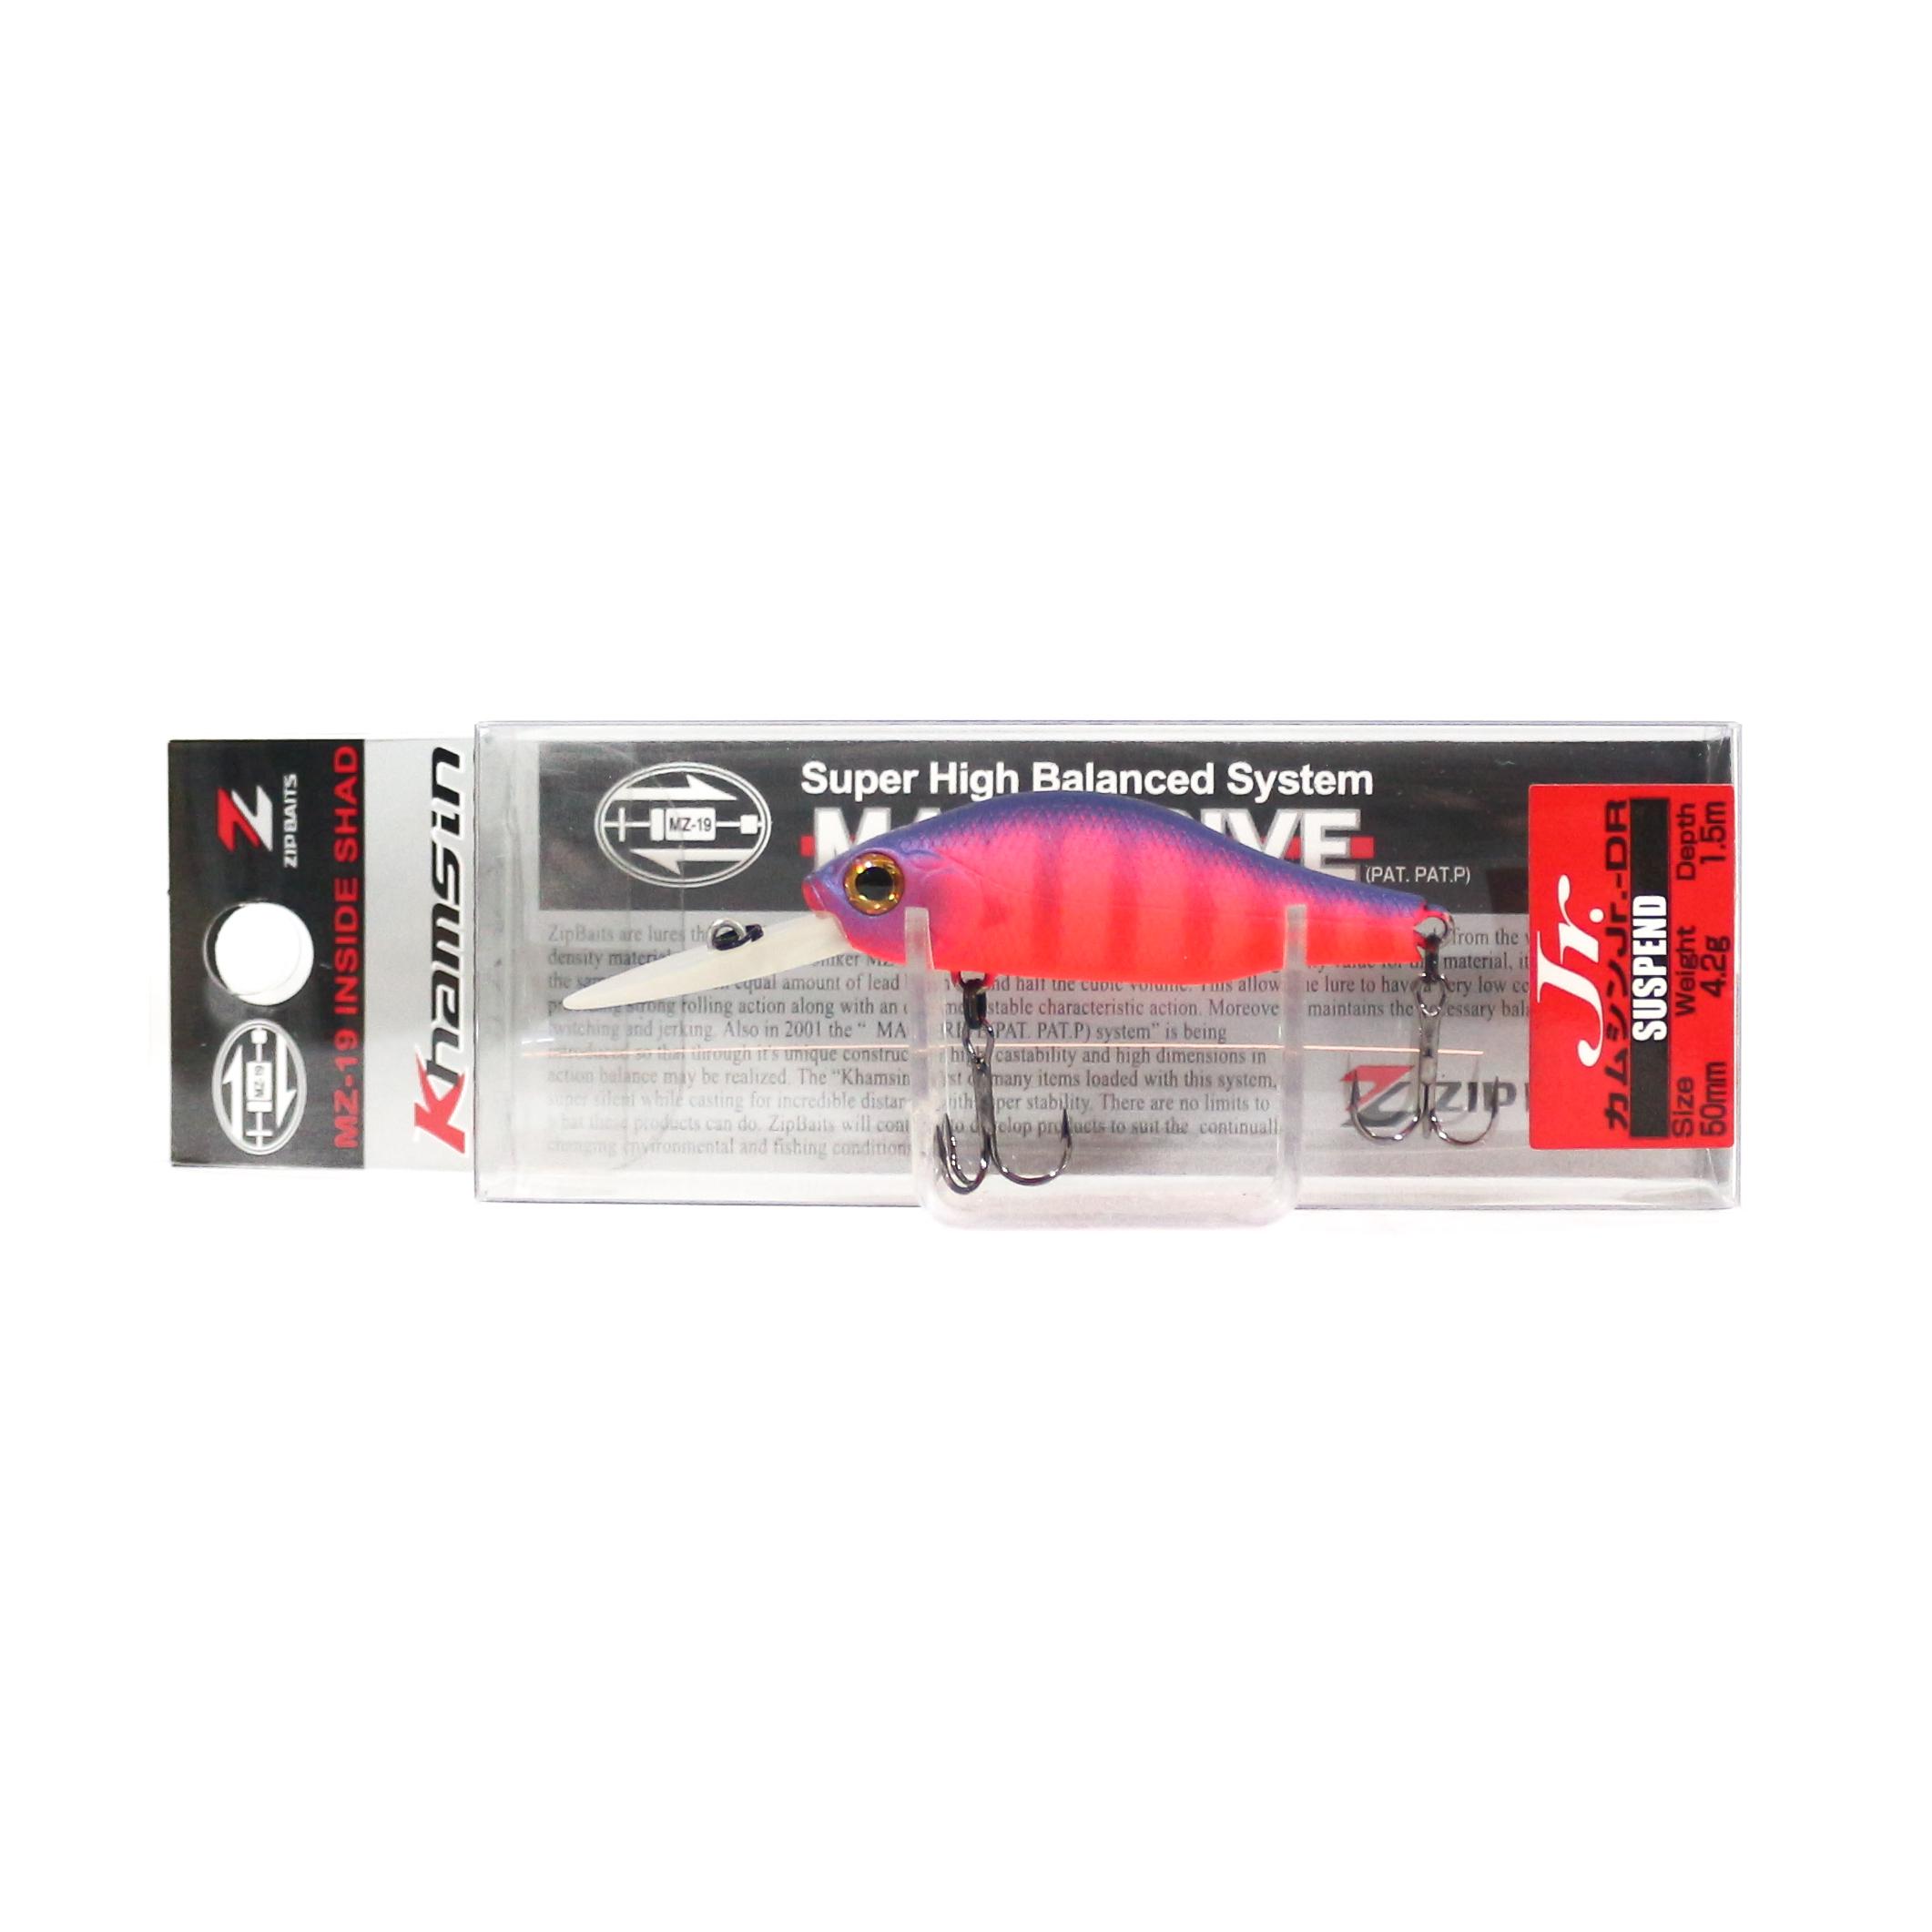 Zipbaits Khamsin Jr. DR 50mm Suspend Lure 992 (6465)